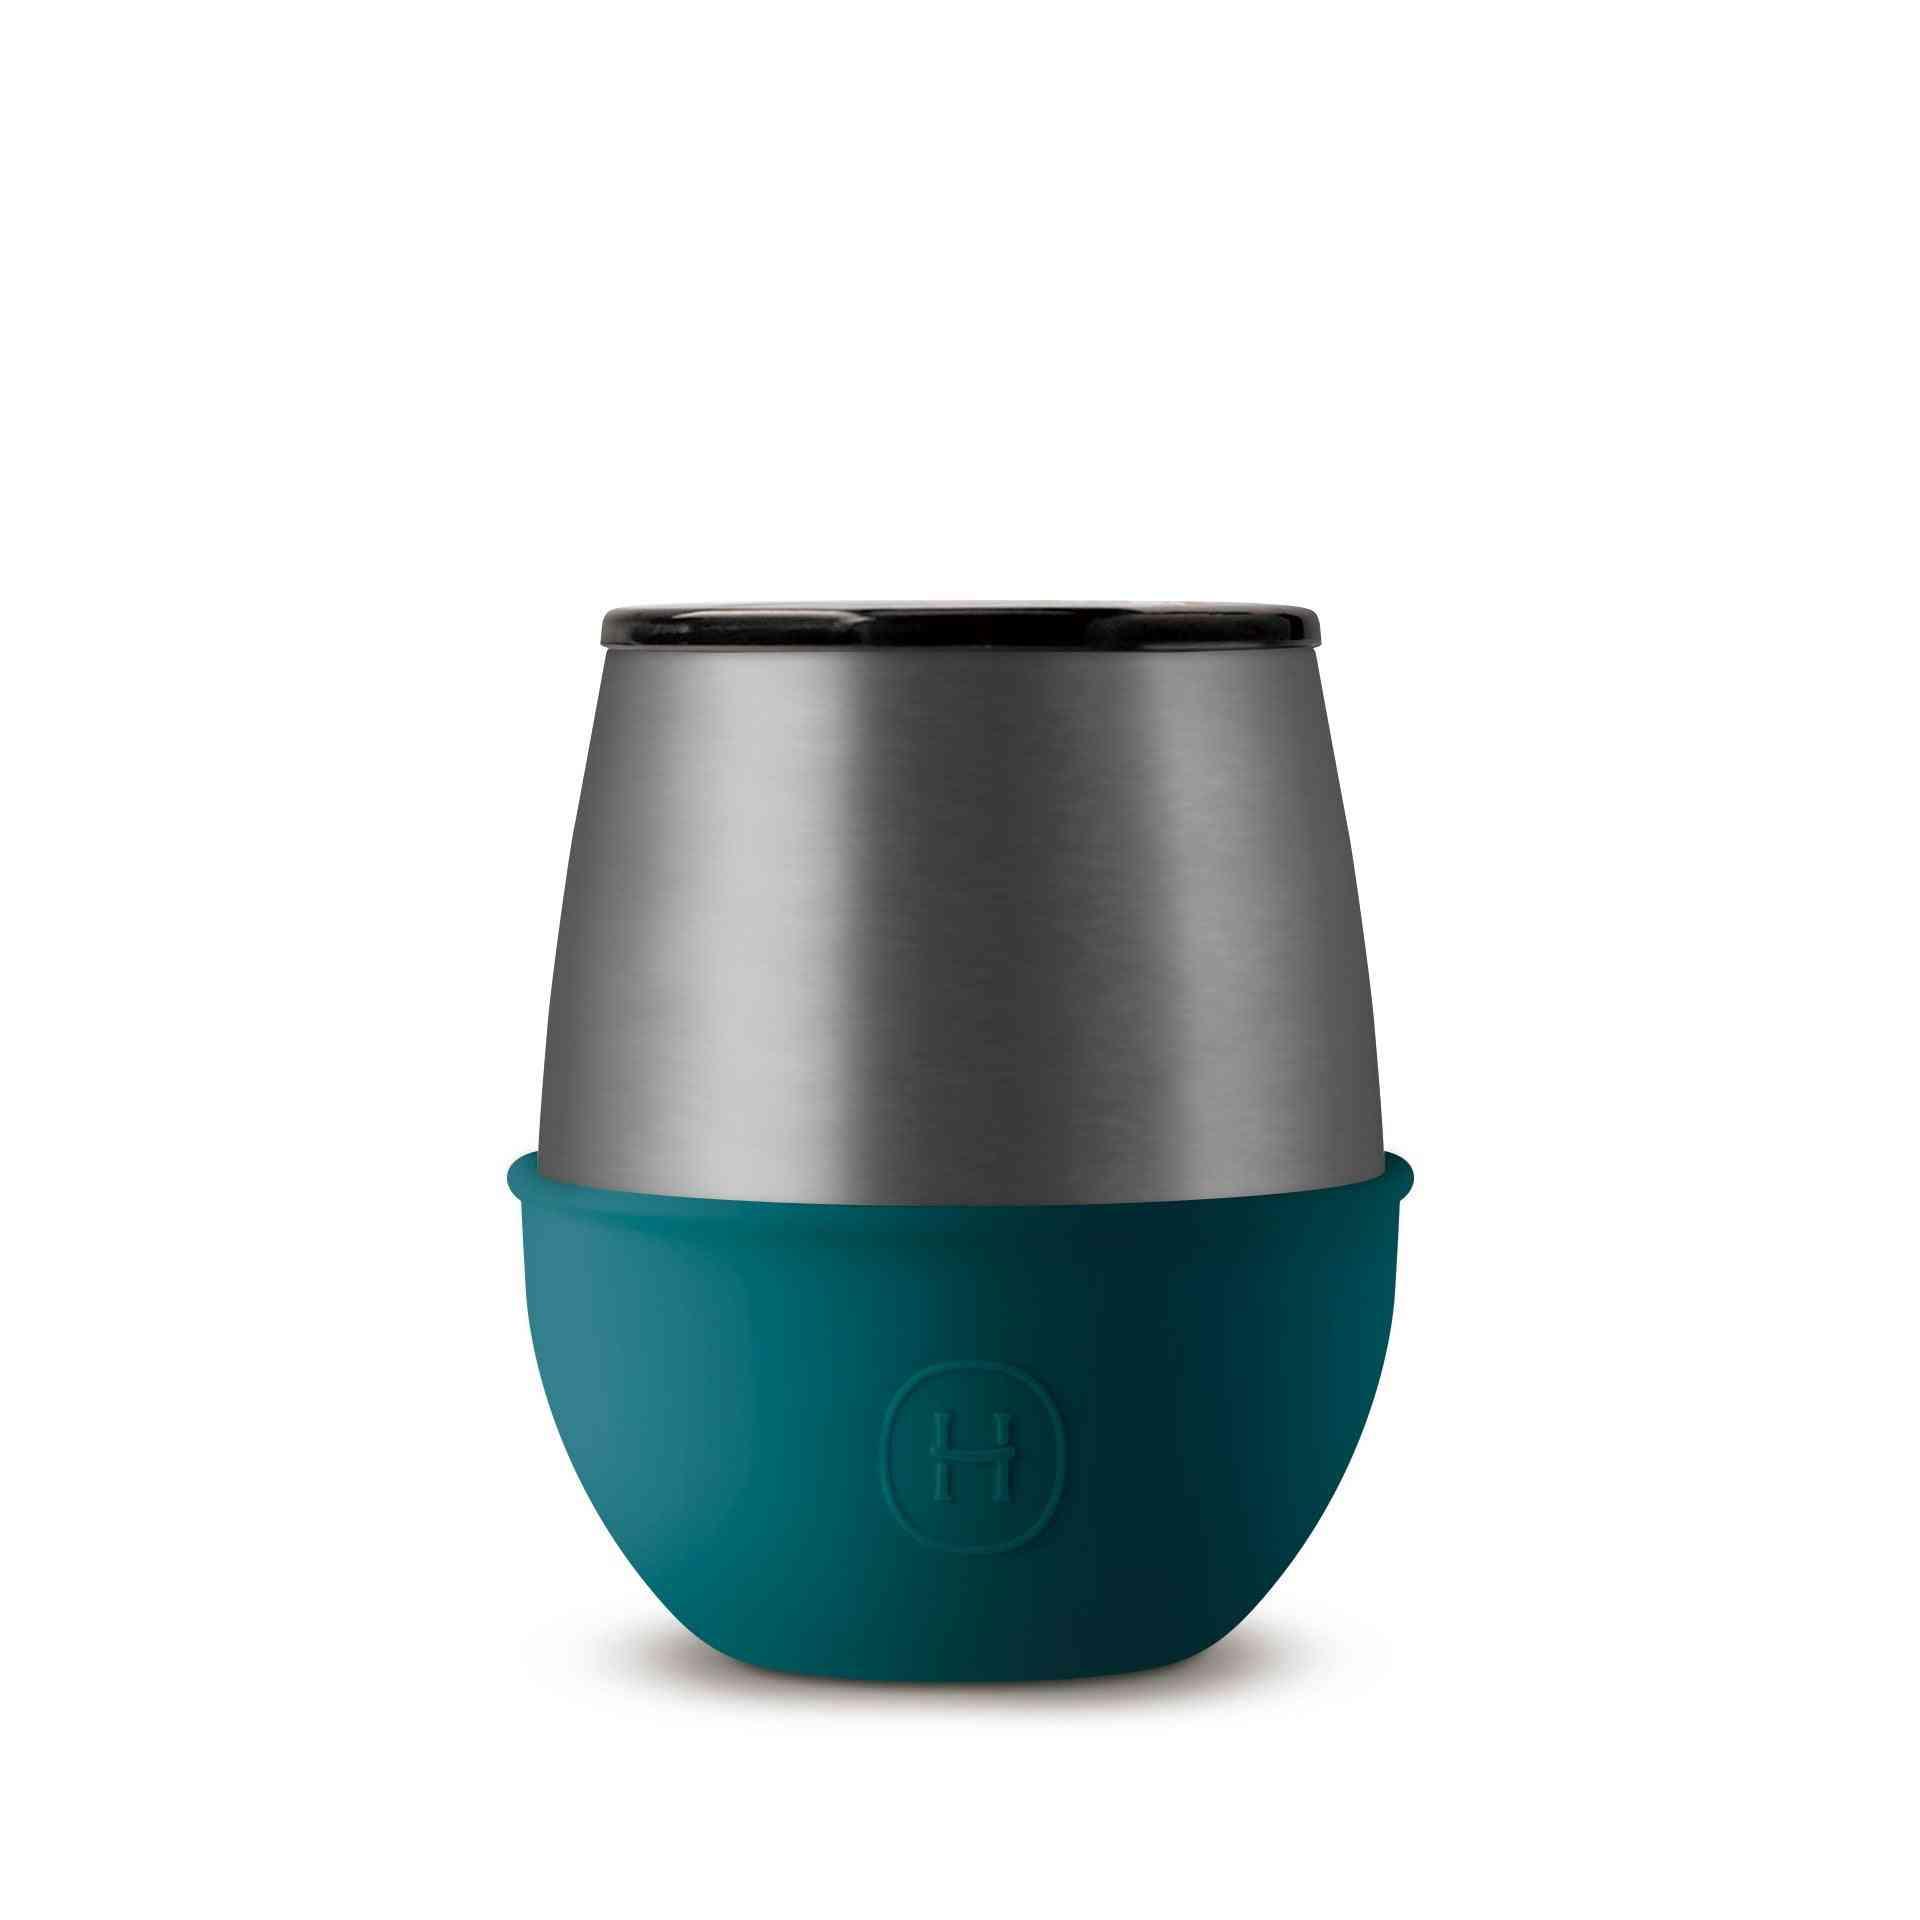 Vaccum Thermal Series Teal Blue Tumbler Drinkware